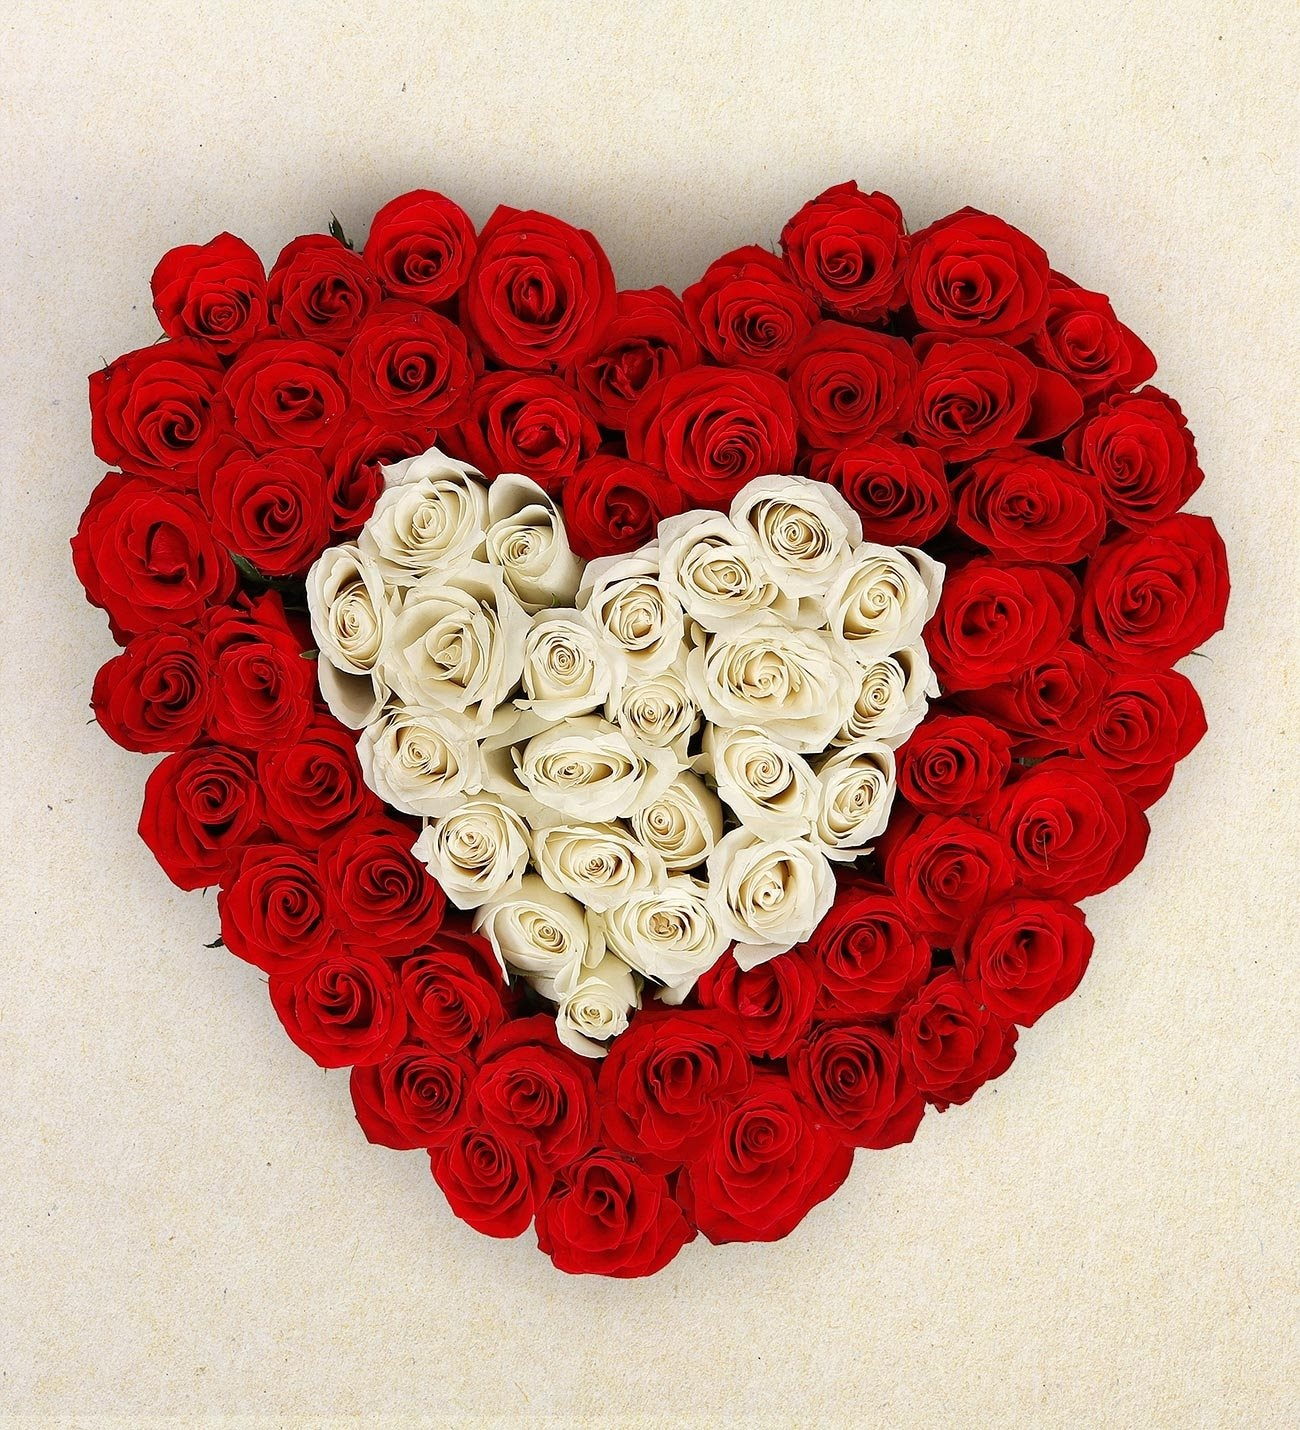 eternal love heart shaped